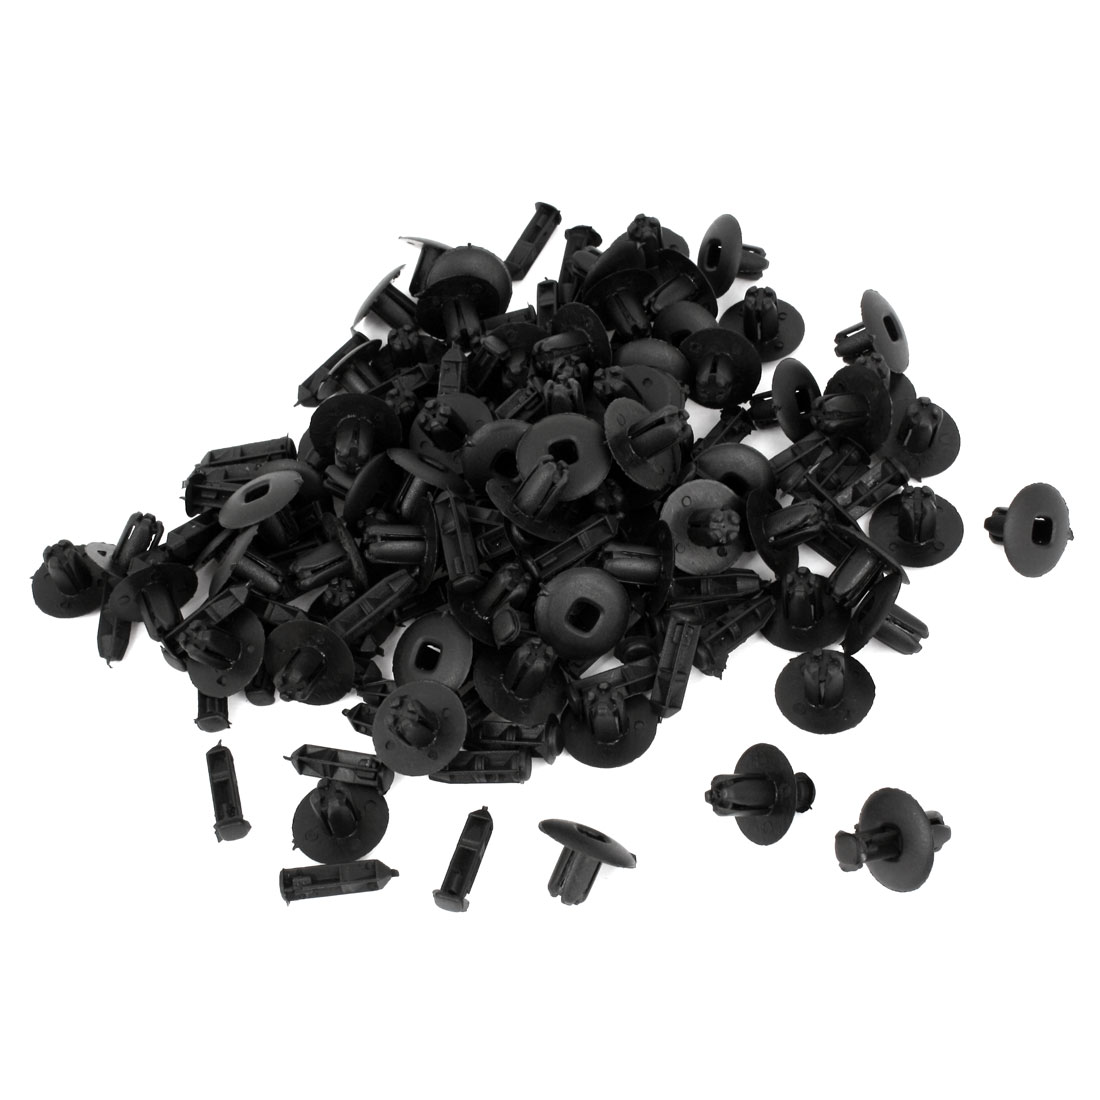 100 Pcs 8mm Hole Dia Black Plastic Rivet Fastener Clips for Auto Truck